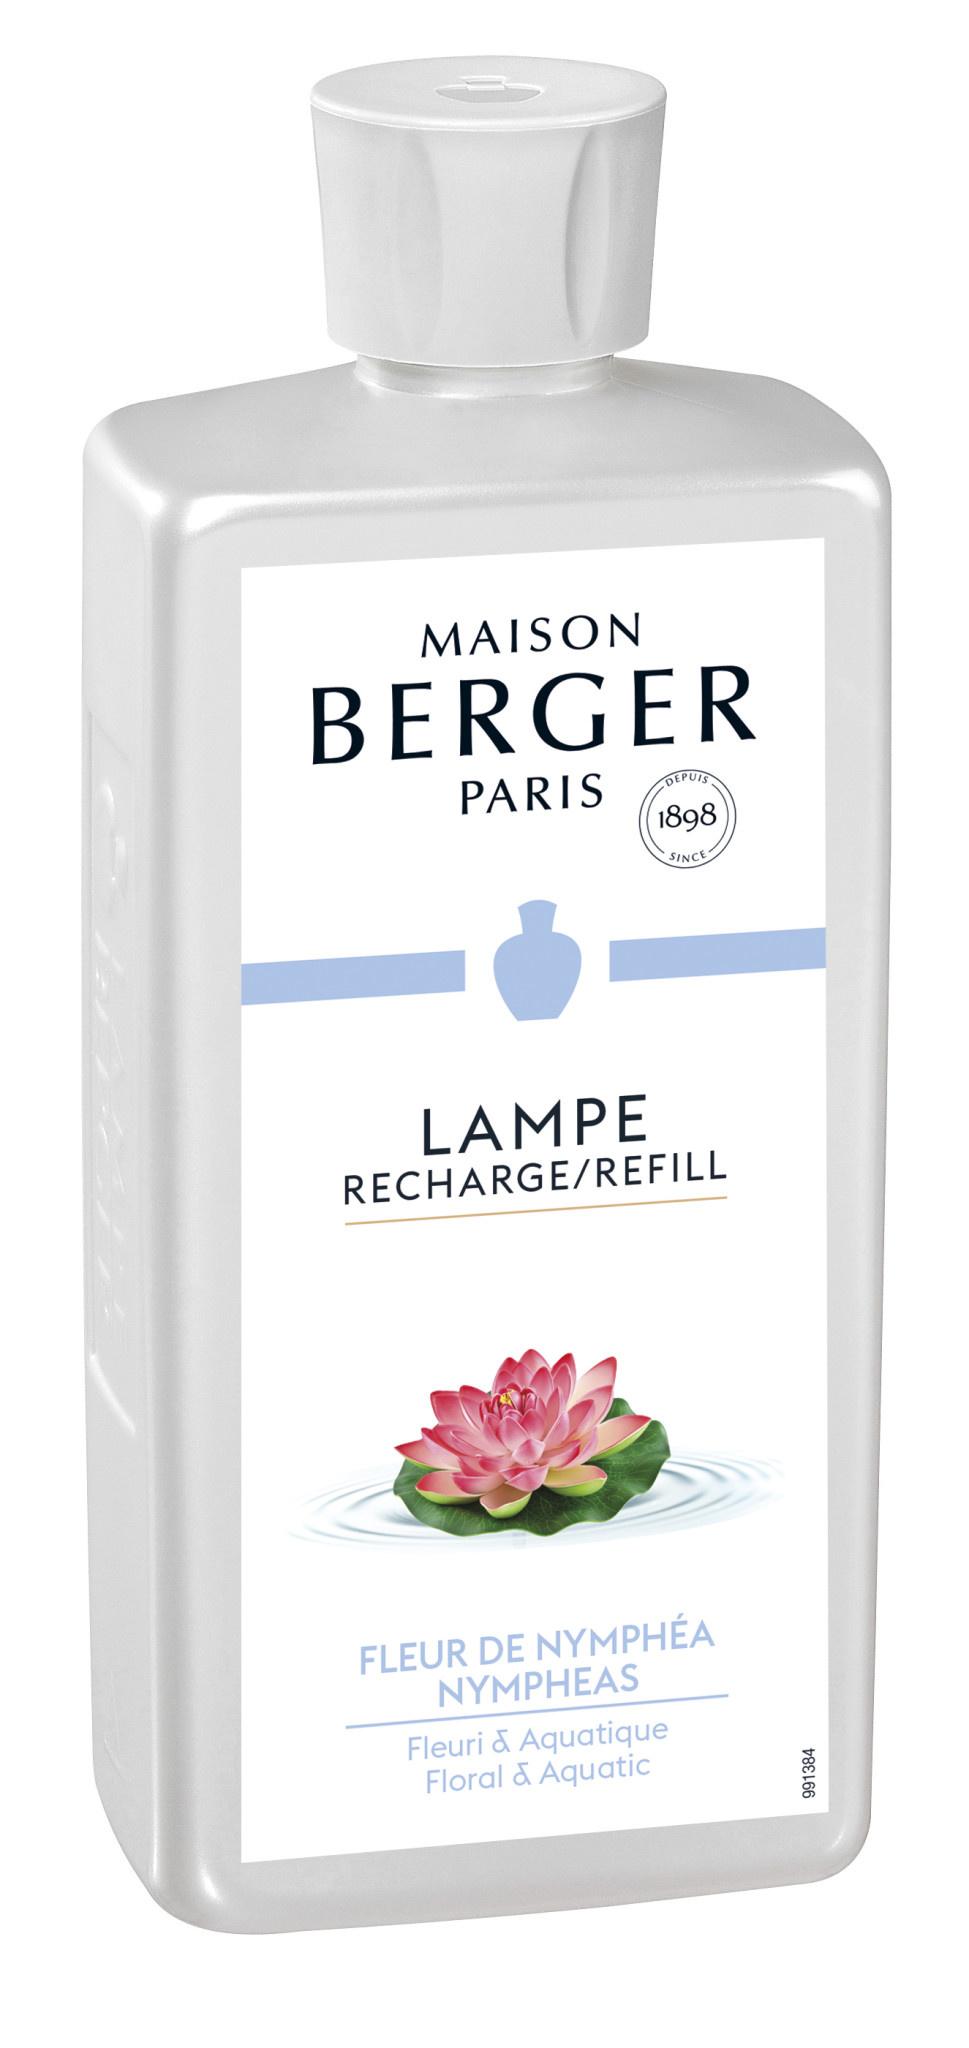 Lampe Berger Fleur de Nymphea 500 ml